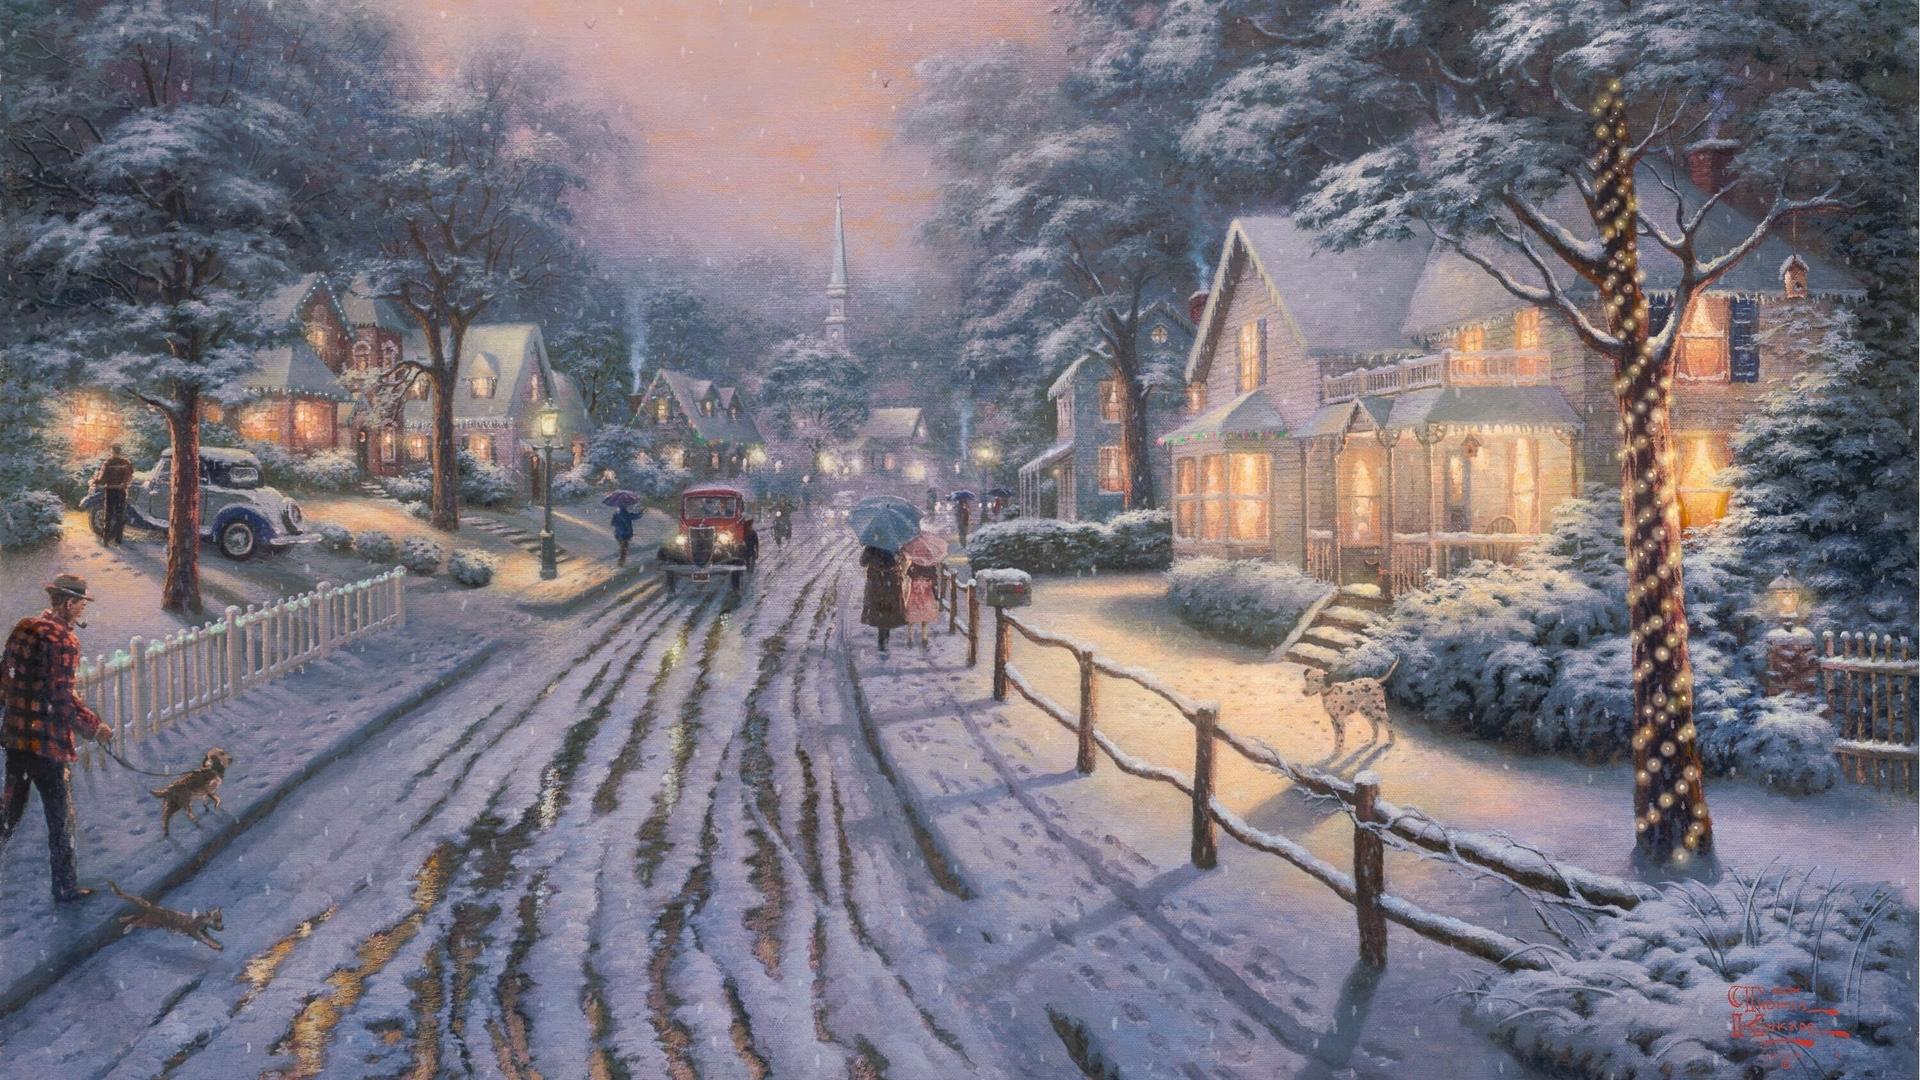 City Street Snow Winter Frost Autumn Weather Season Residential Area